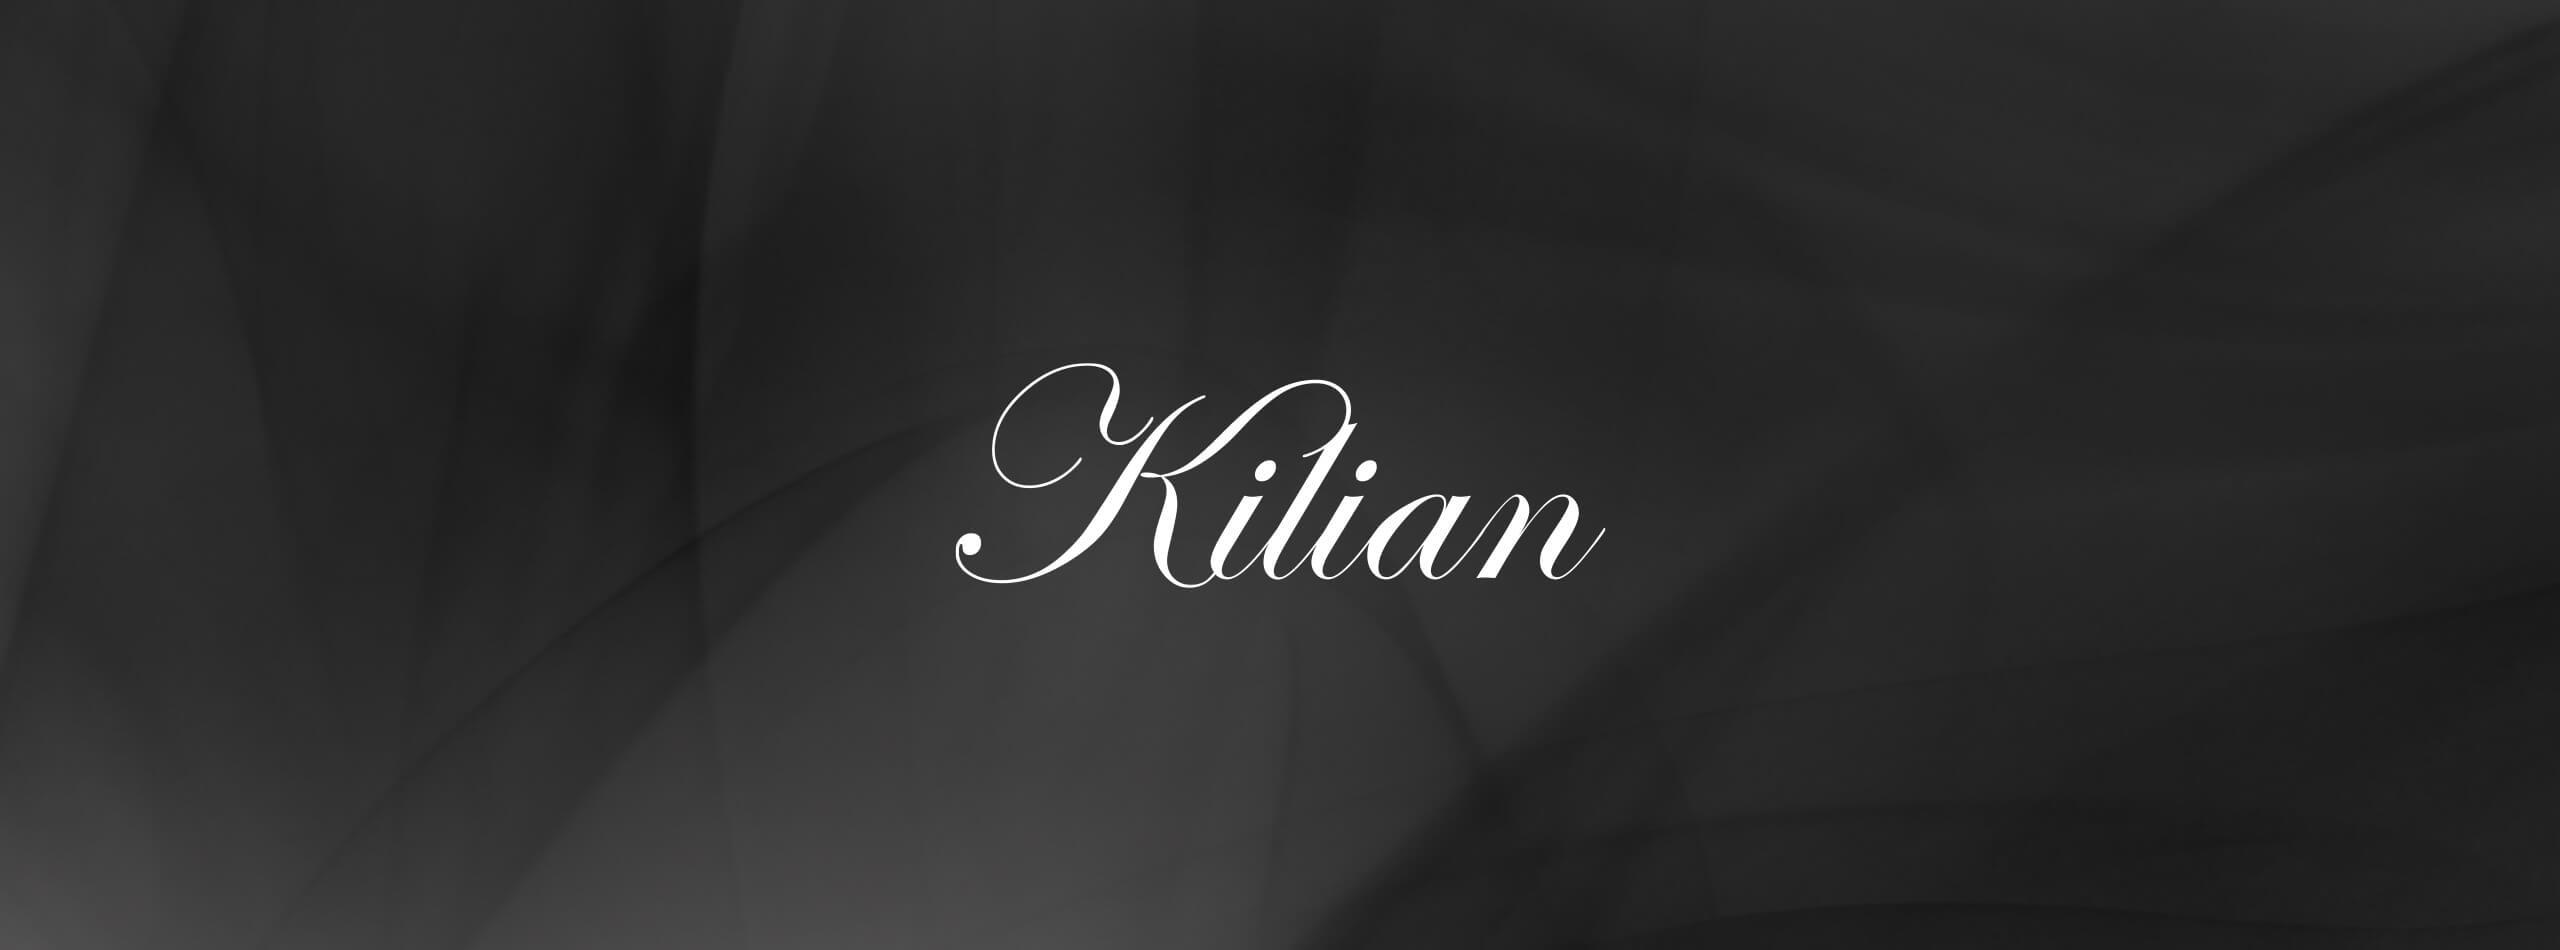 KILIAN_HERO-IMAGE-2